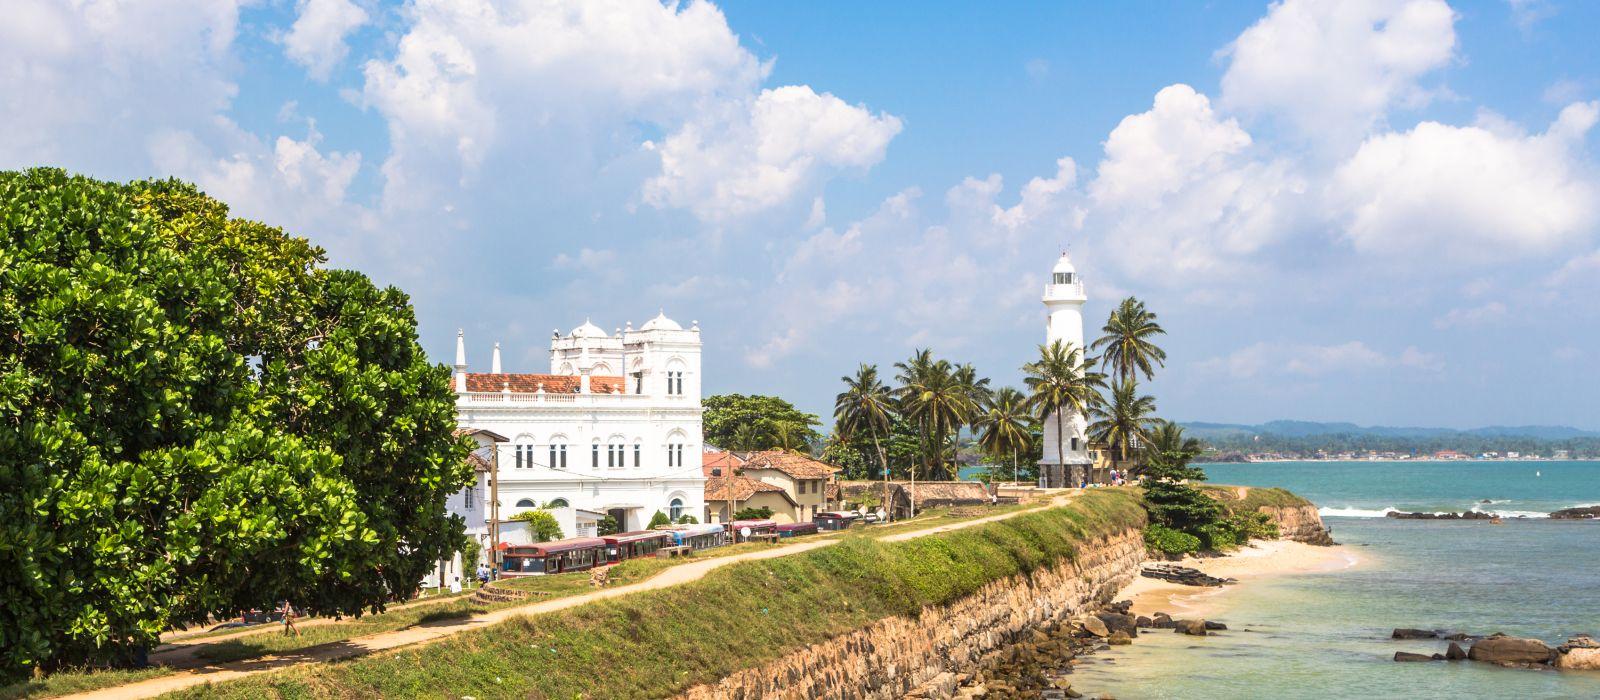 Sri Lanka: Ancient Wonders and Beaches Tour Trip 3